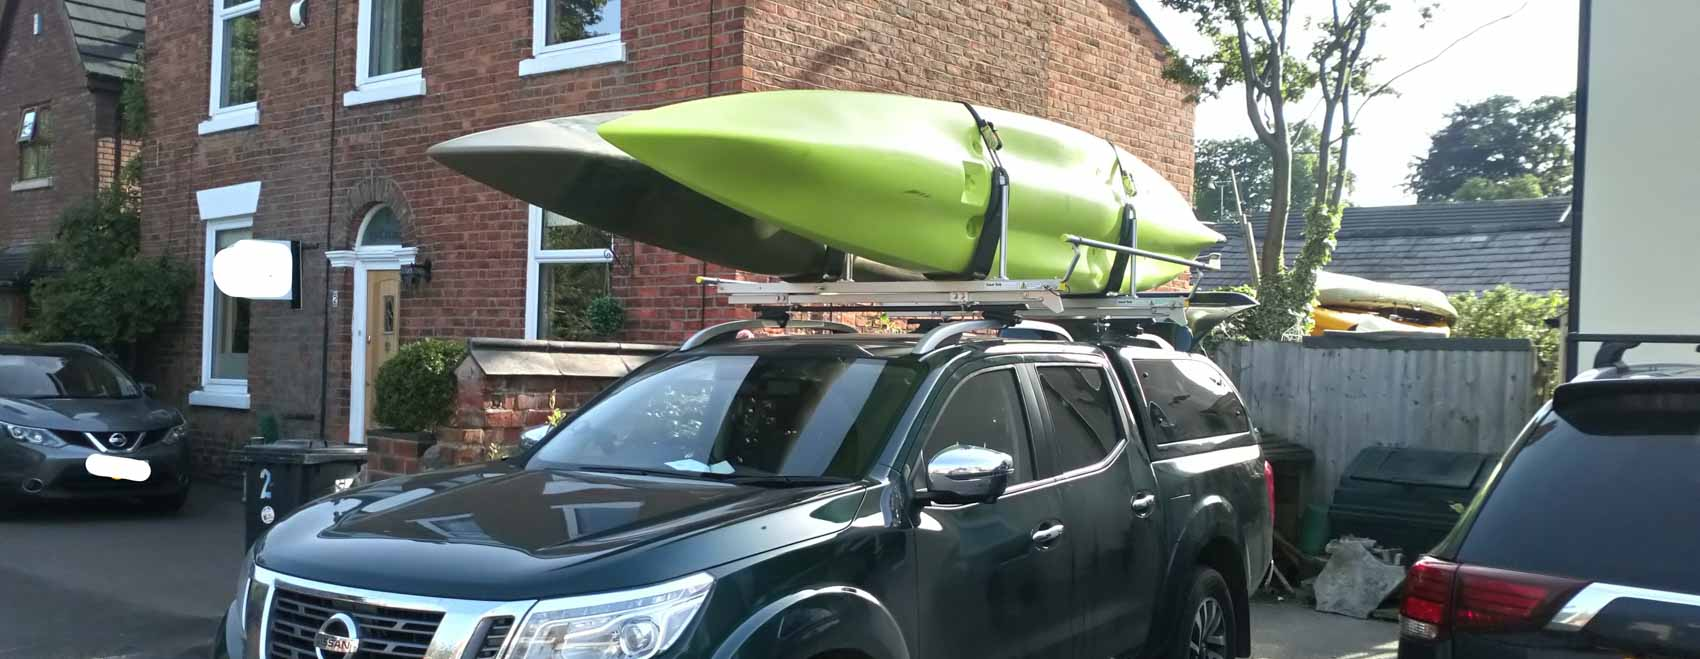 Karitek - all the kayaking gear to get you here!